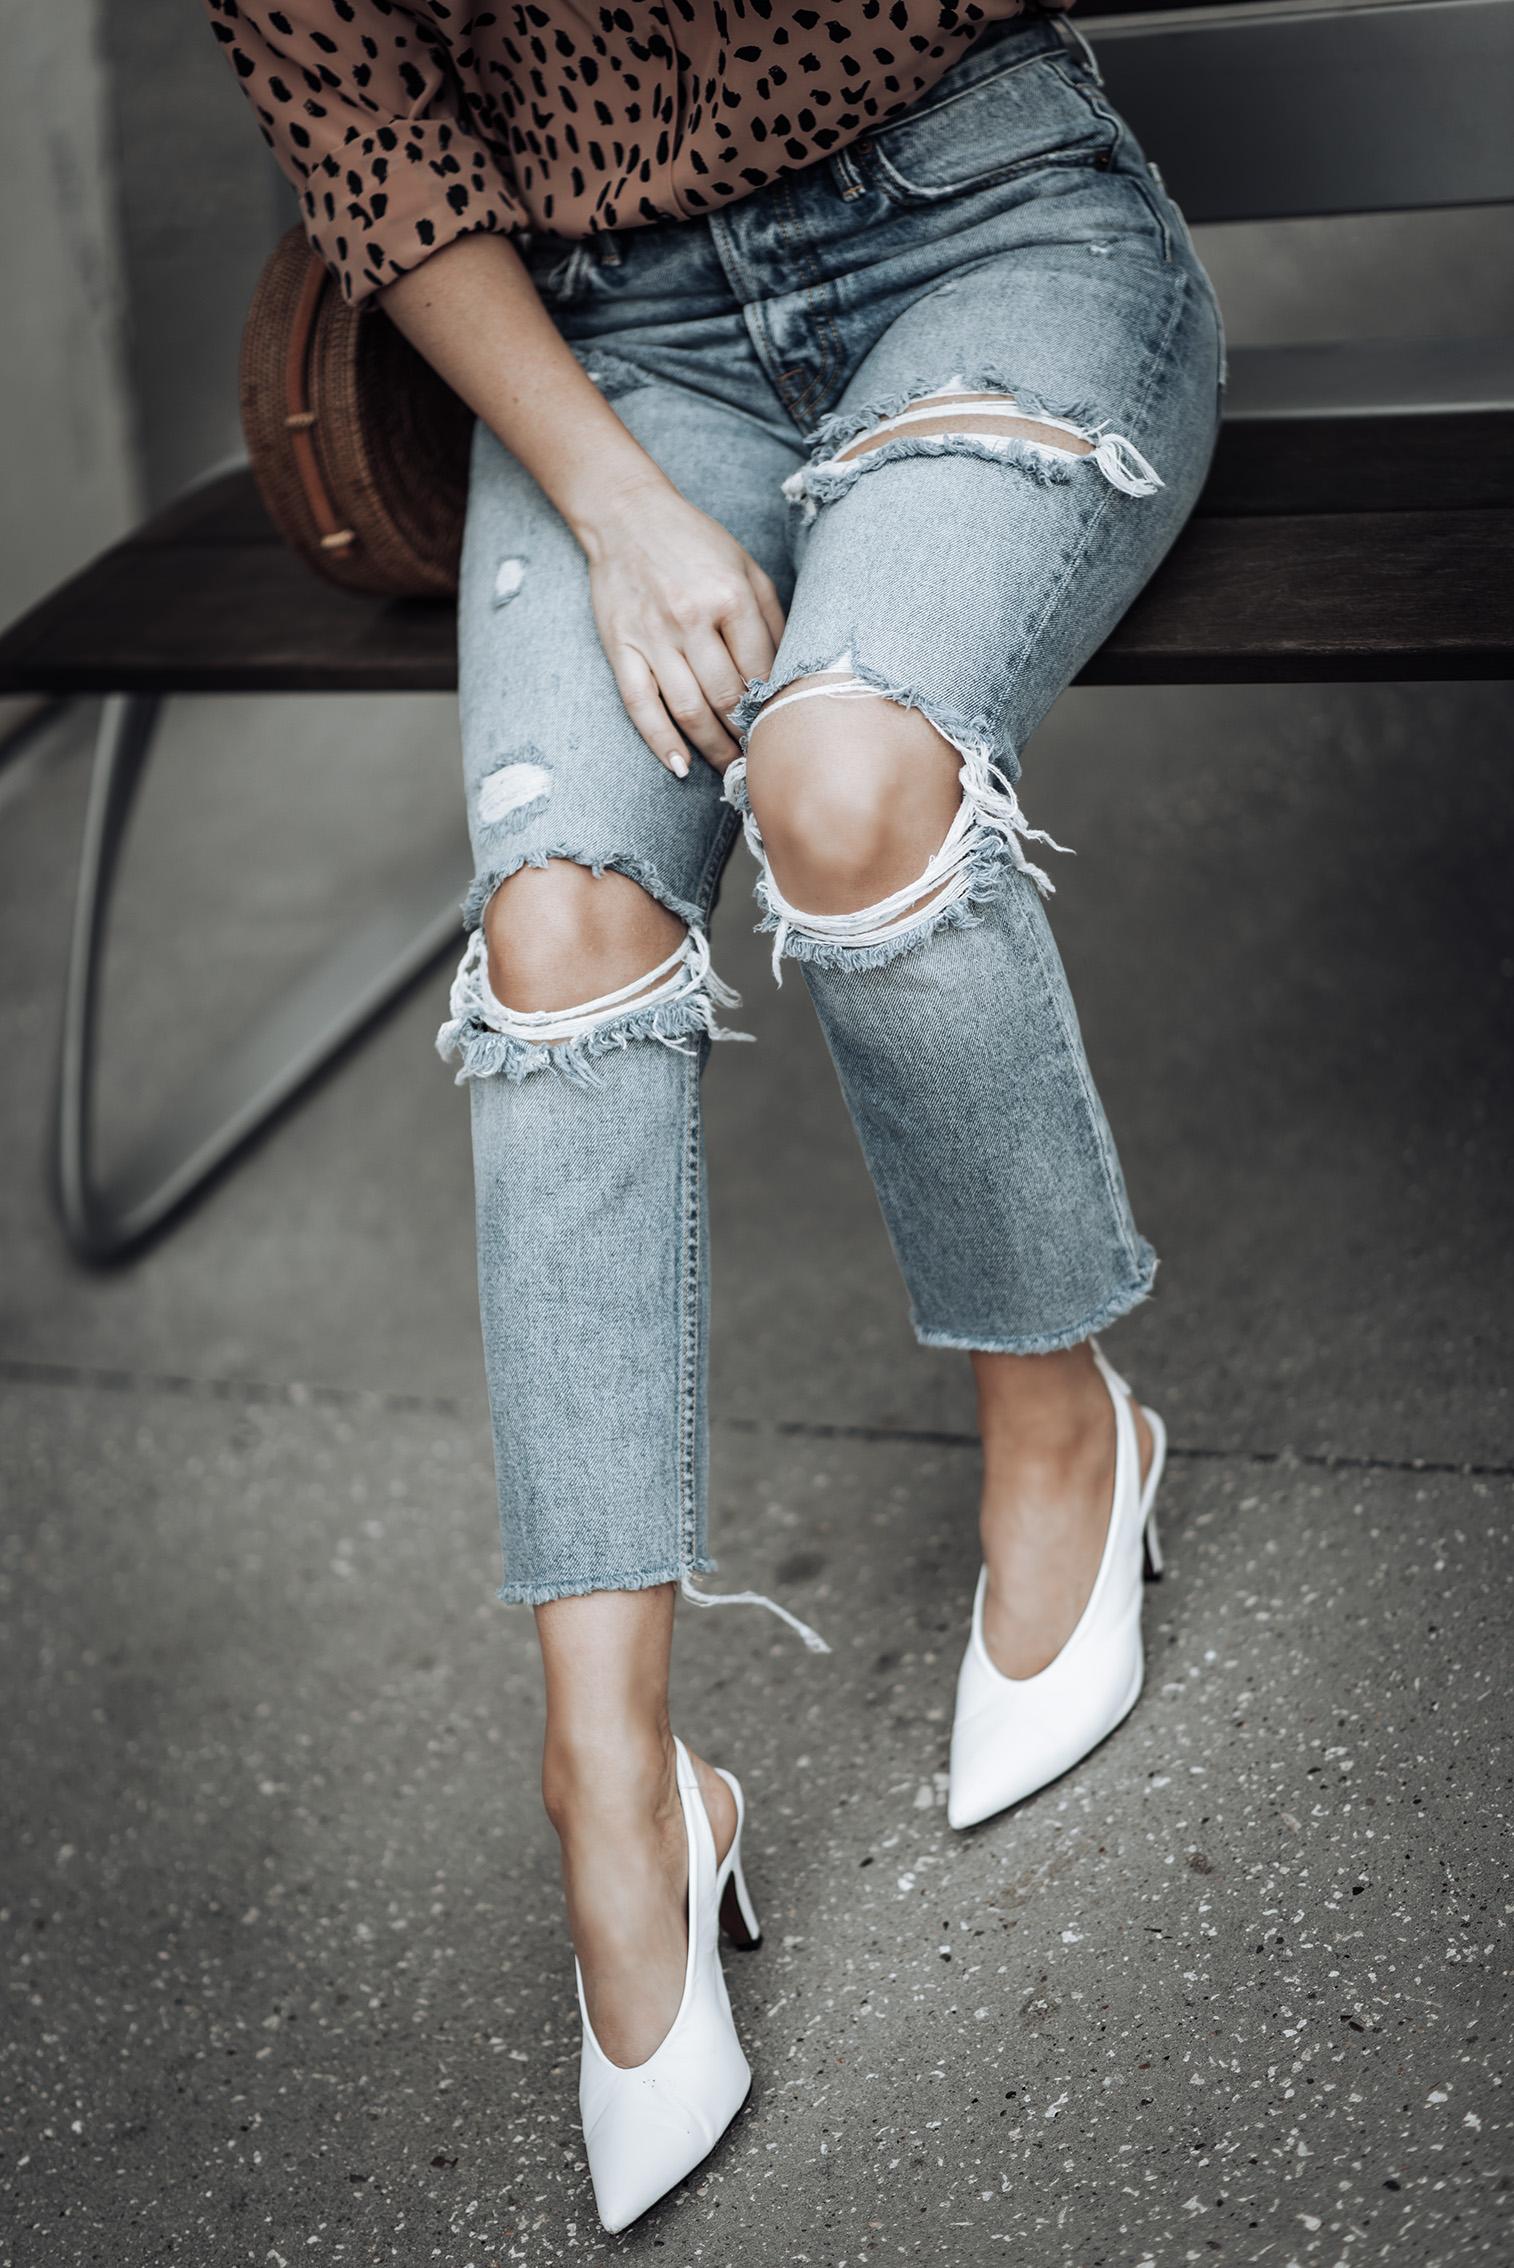 Animal print | Tiffany Jais fashion and lifestyle blogger of Flaunt and Center | Houston fashion blogger | Straw handbag Trend | Streetstyle blog